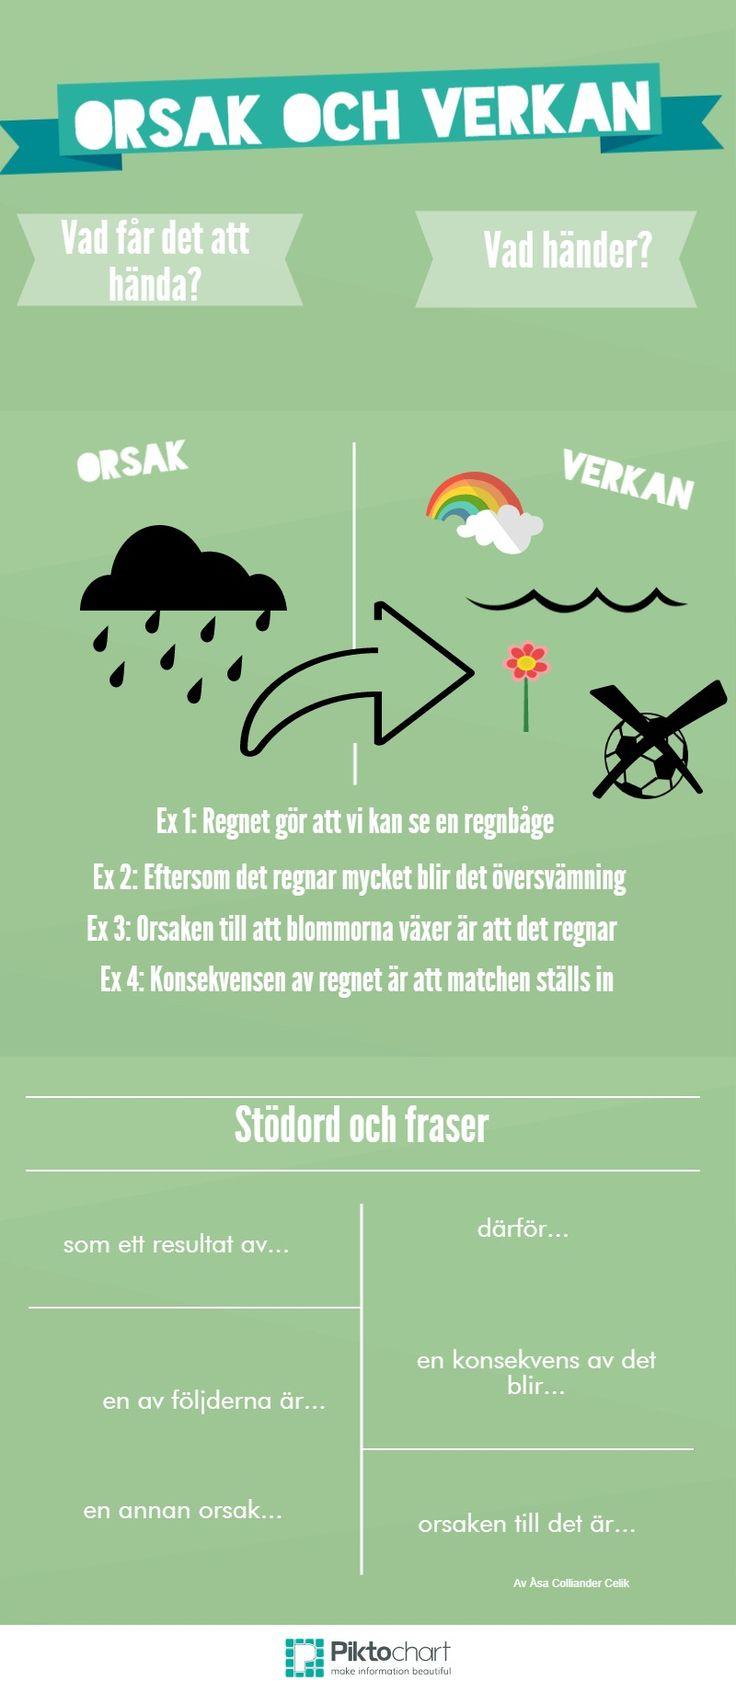 Orsak och verkan | @Piktochart Infographic